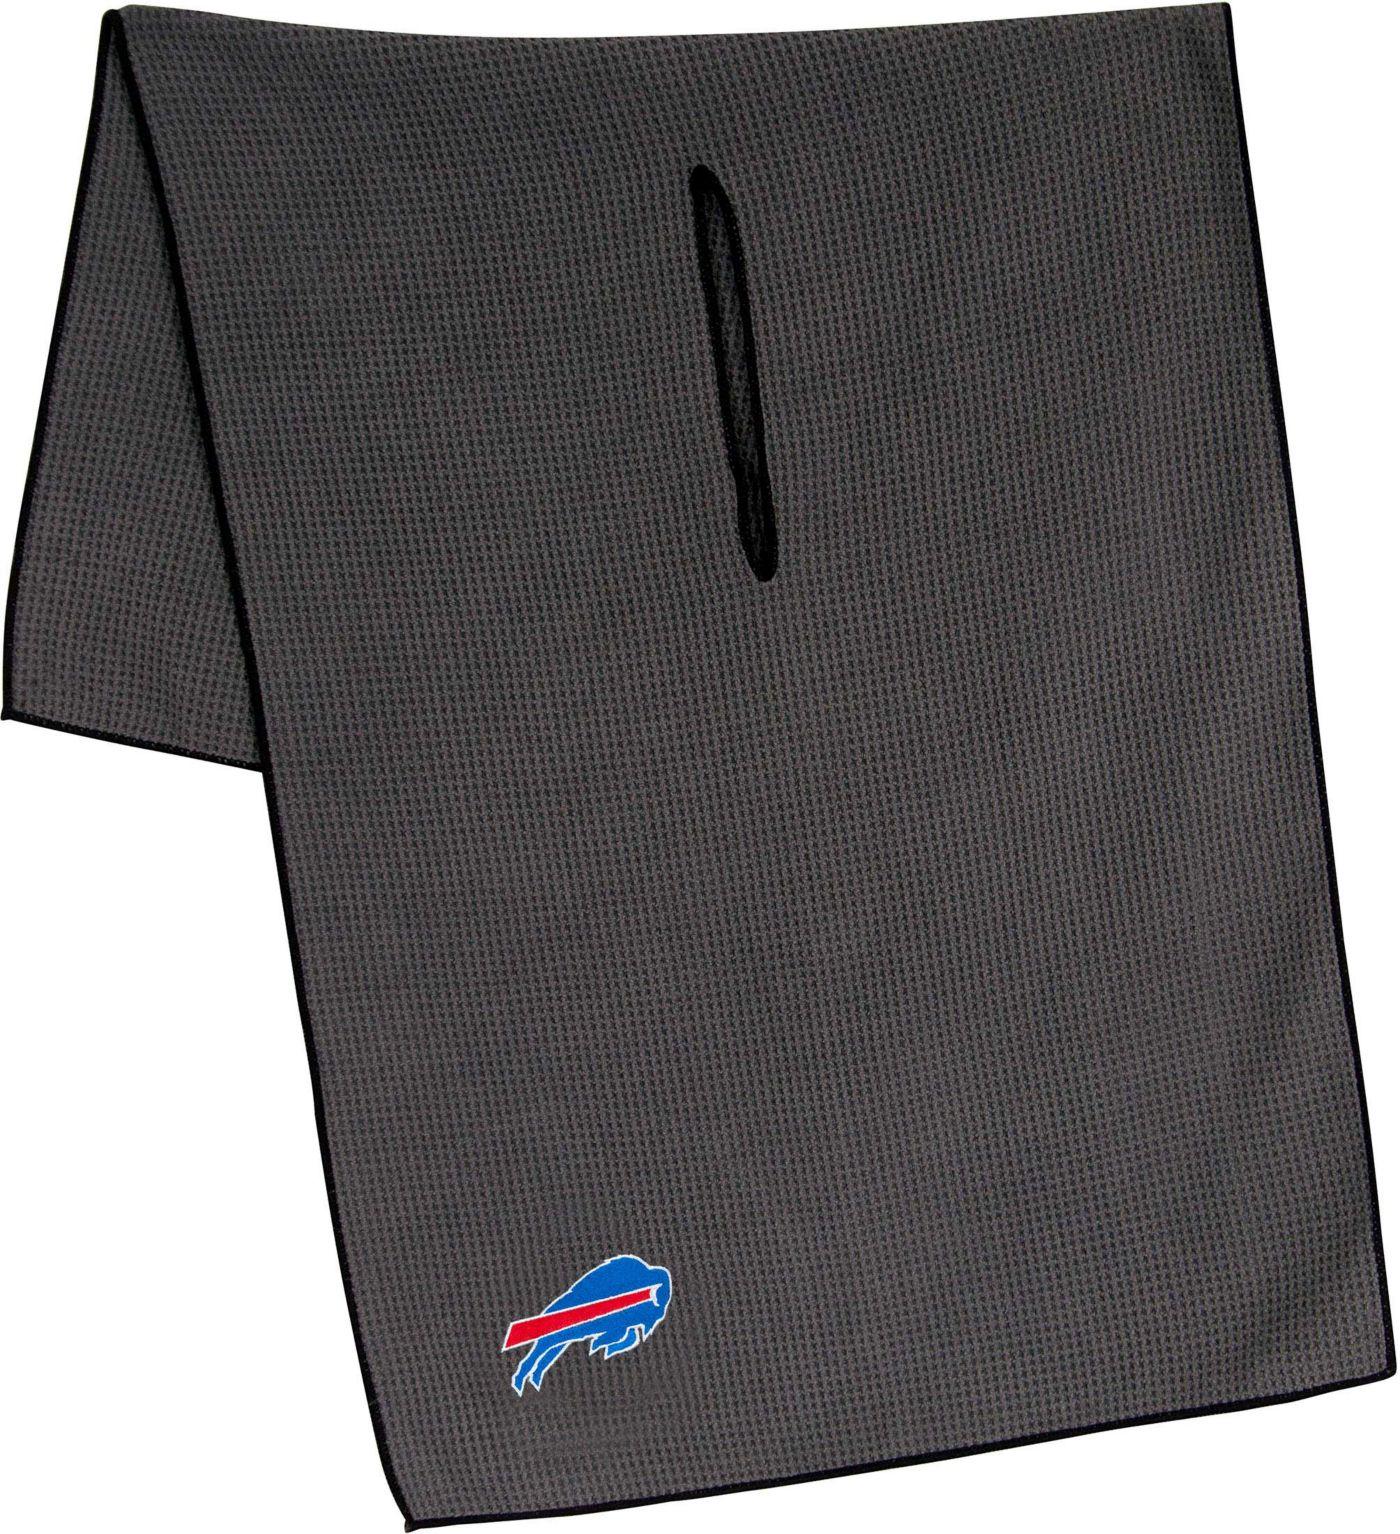 "Team Effort Buffalo Bills 19"" x 41"" Microfiber Golf Towel"